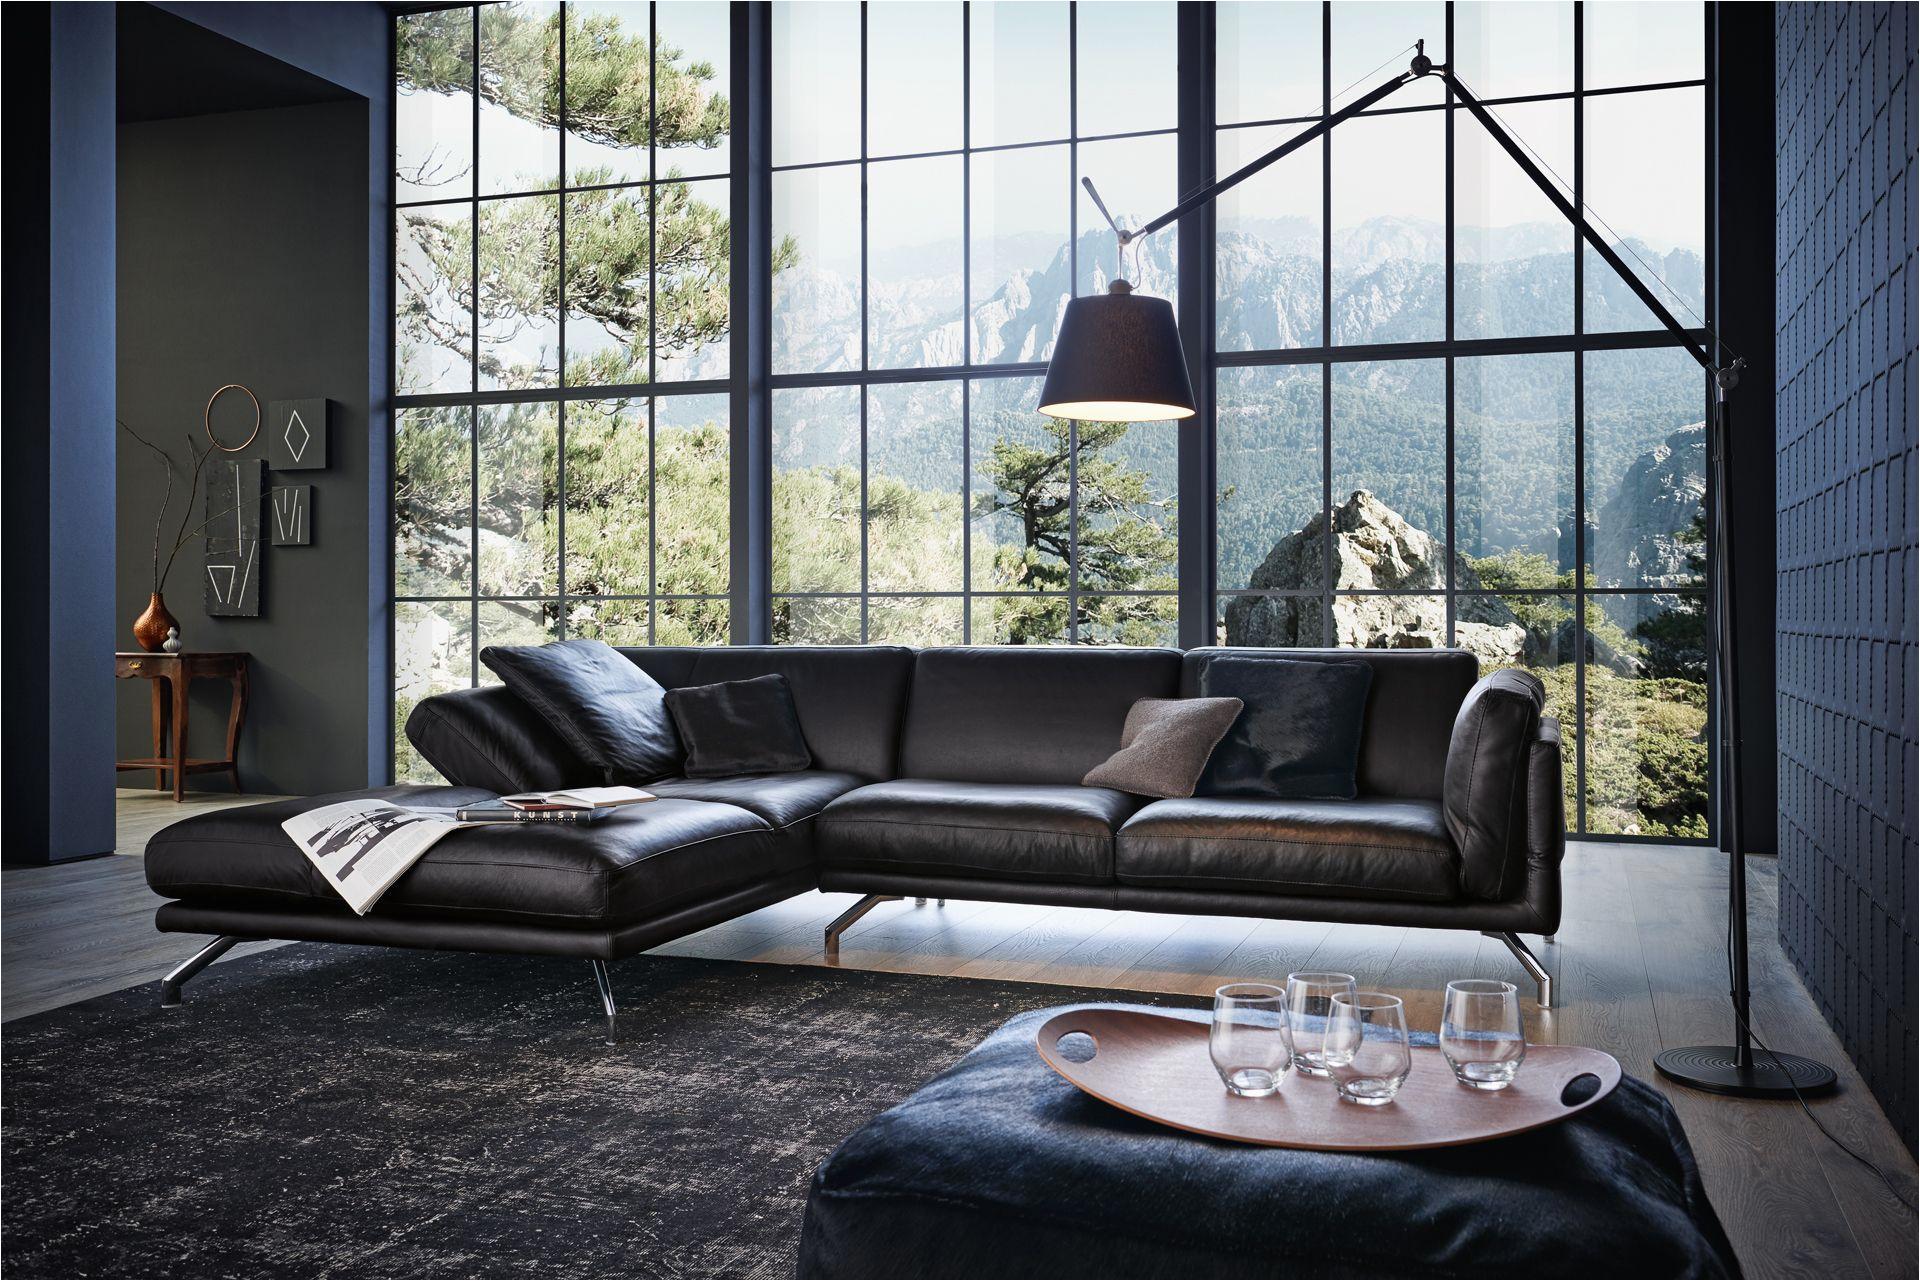 Hall sofa Design Wk 650 Nalo